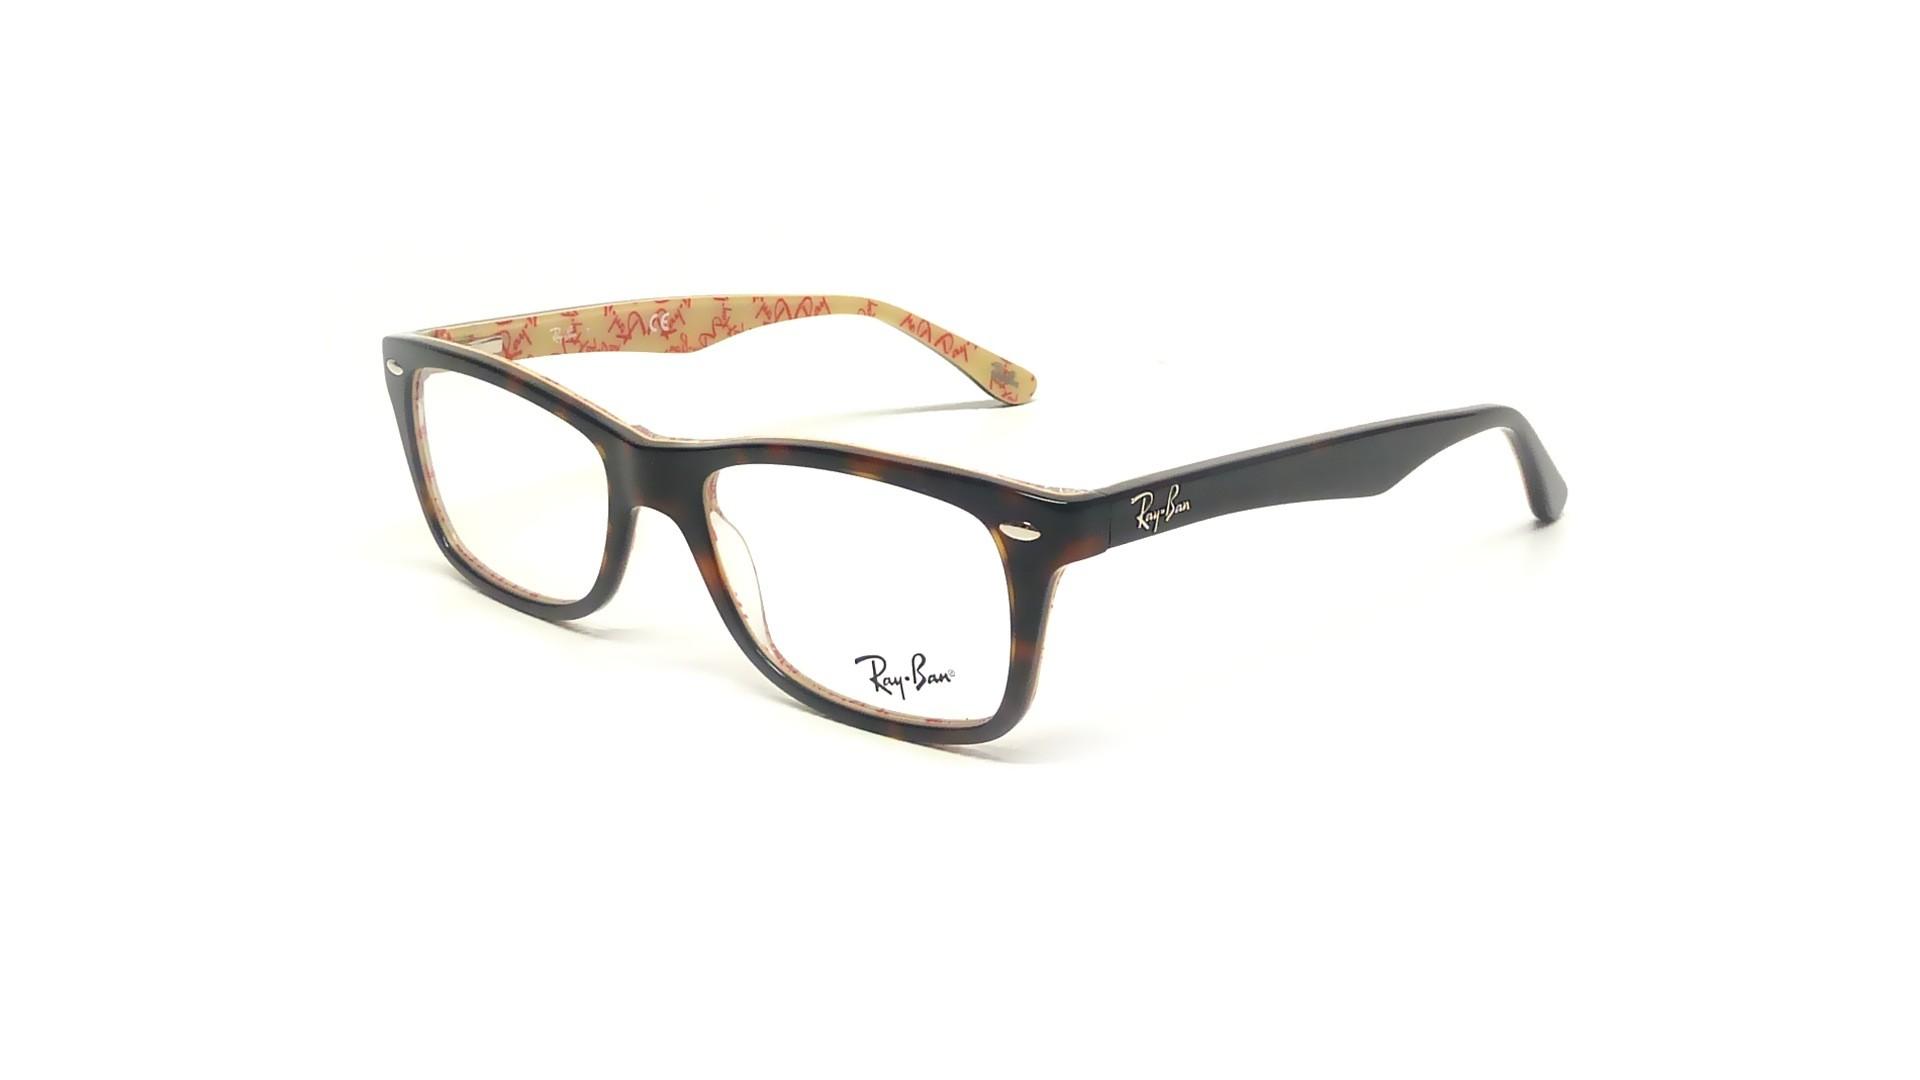 22003c3916 Eyeglasses Ray-Ban RX5228 RB5228 5057 53-17 Tortoise Medium